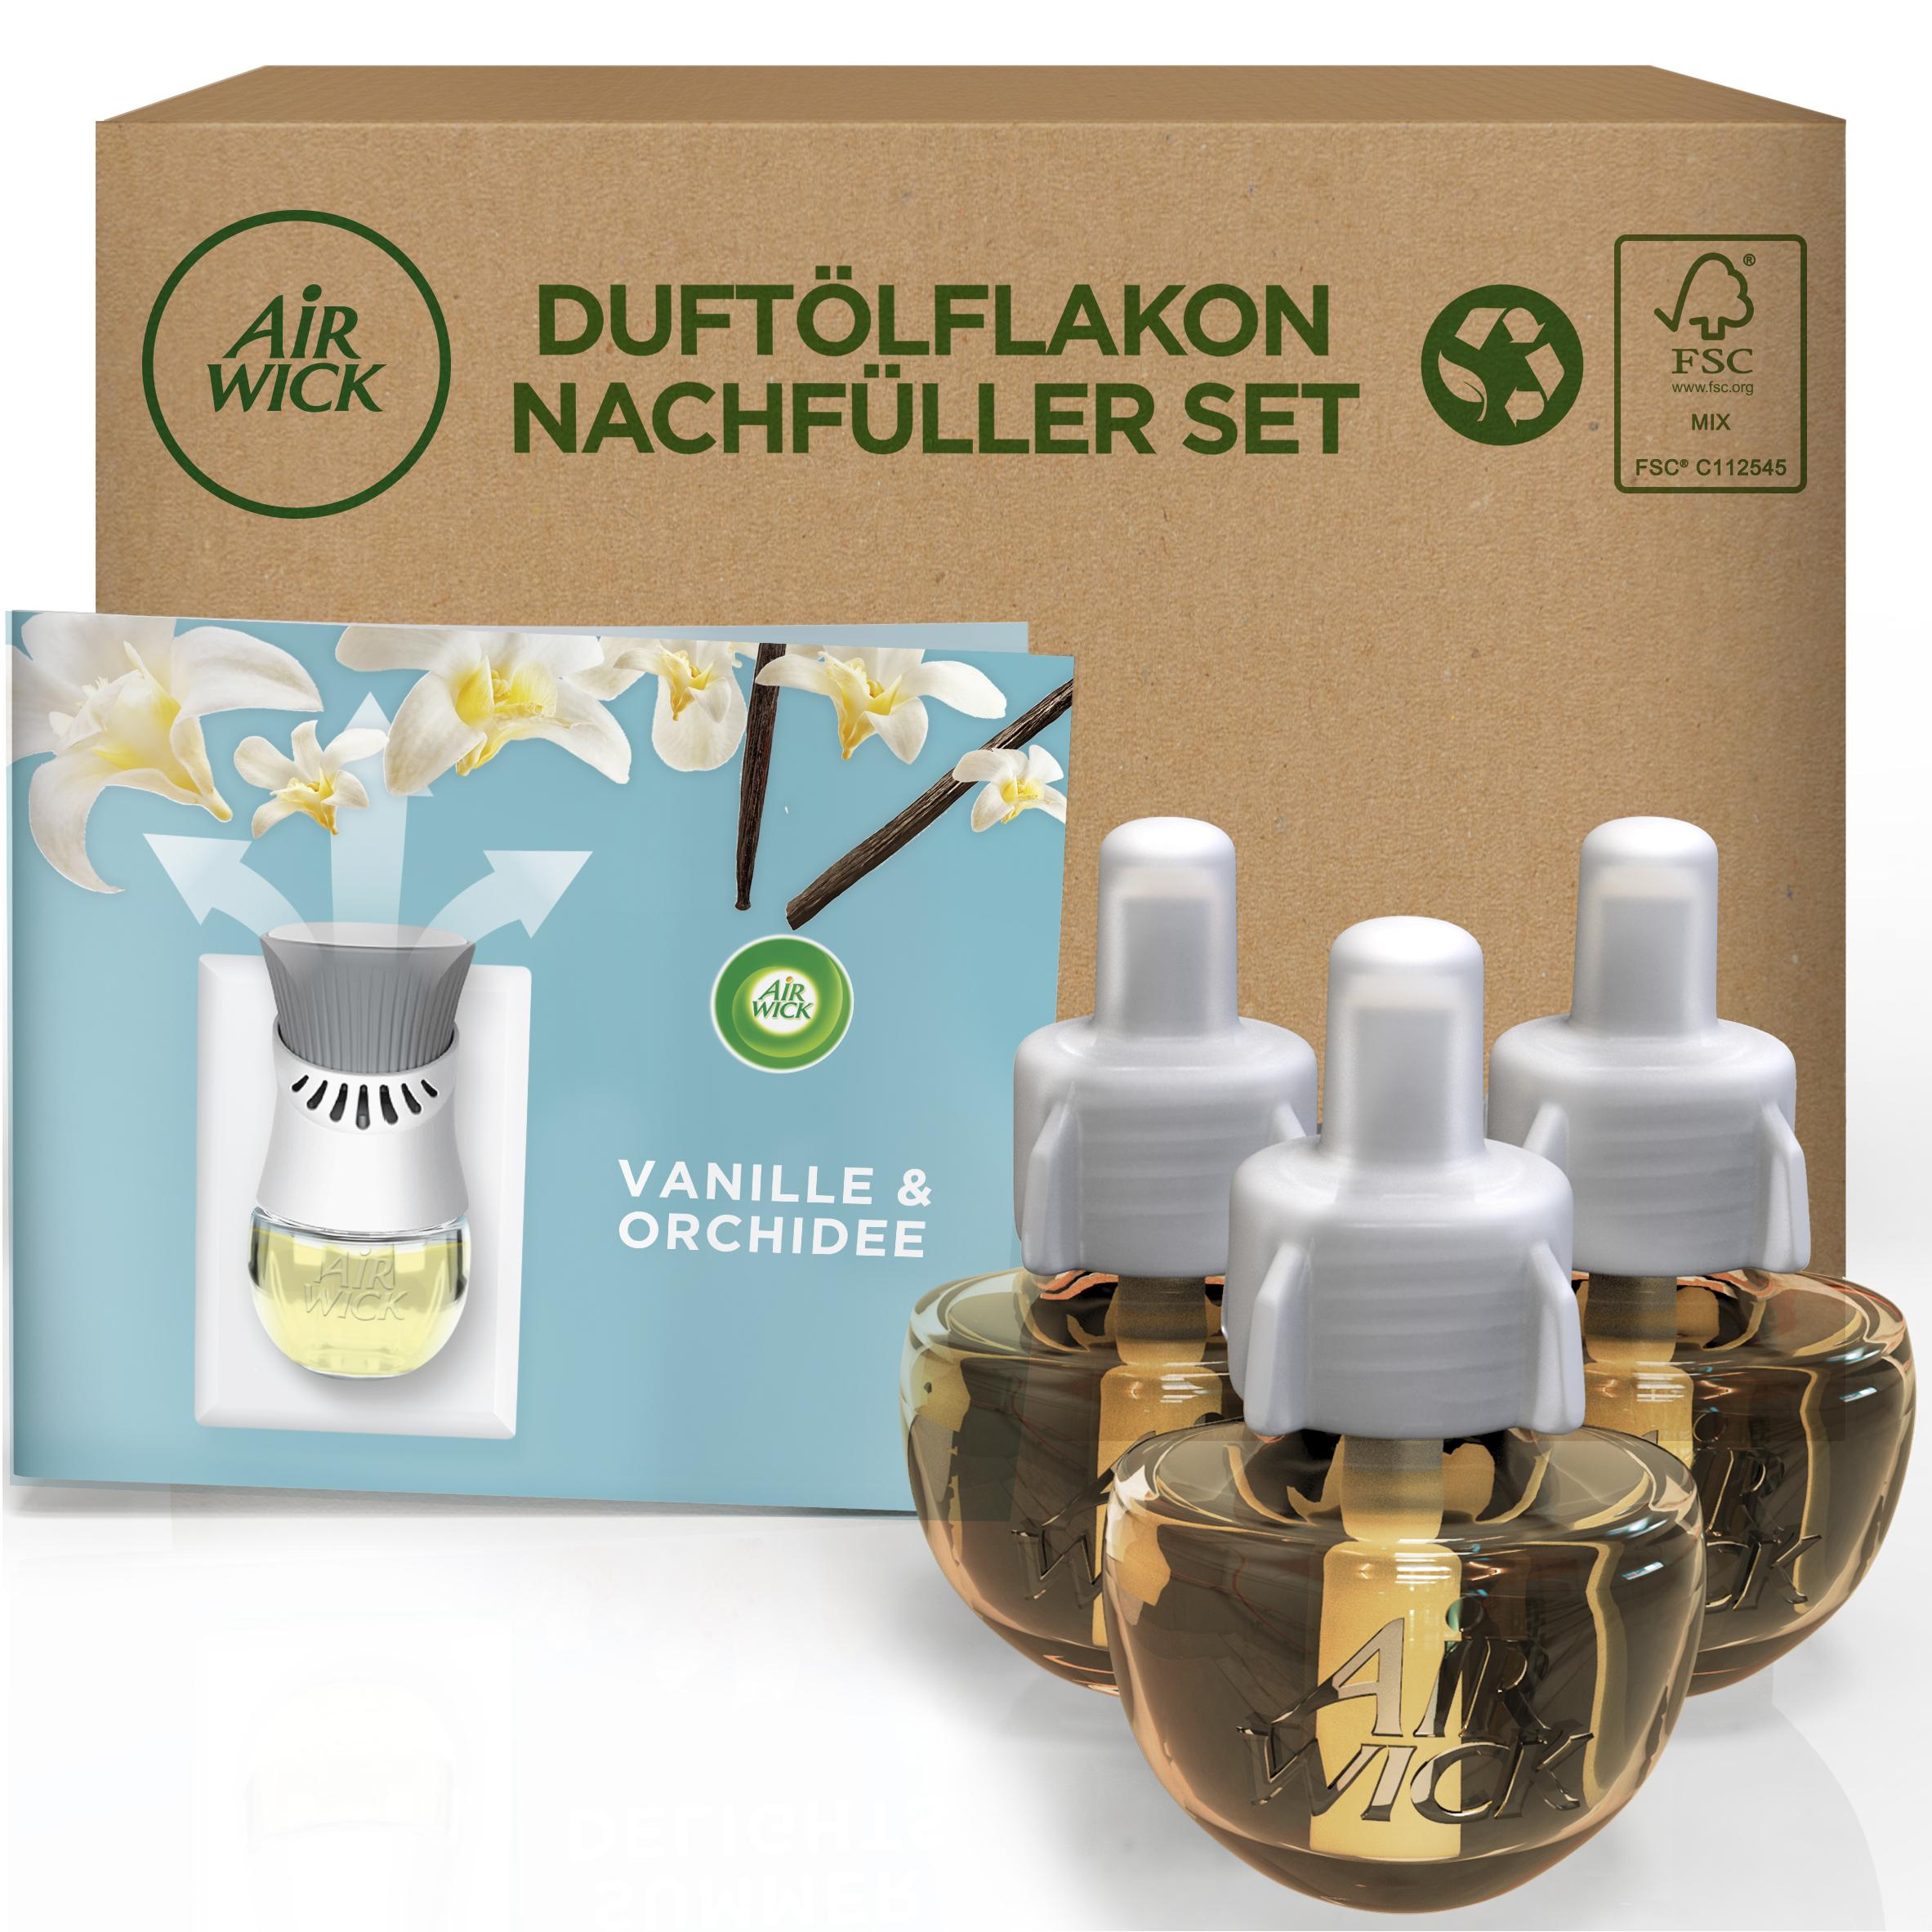 Air Wick Duftölflakon eCom Nachfüller-Set Vanille & Orchidee